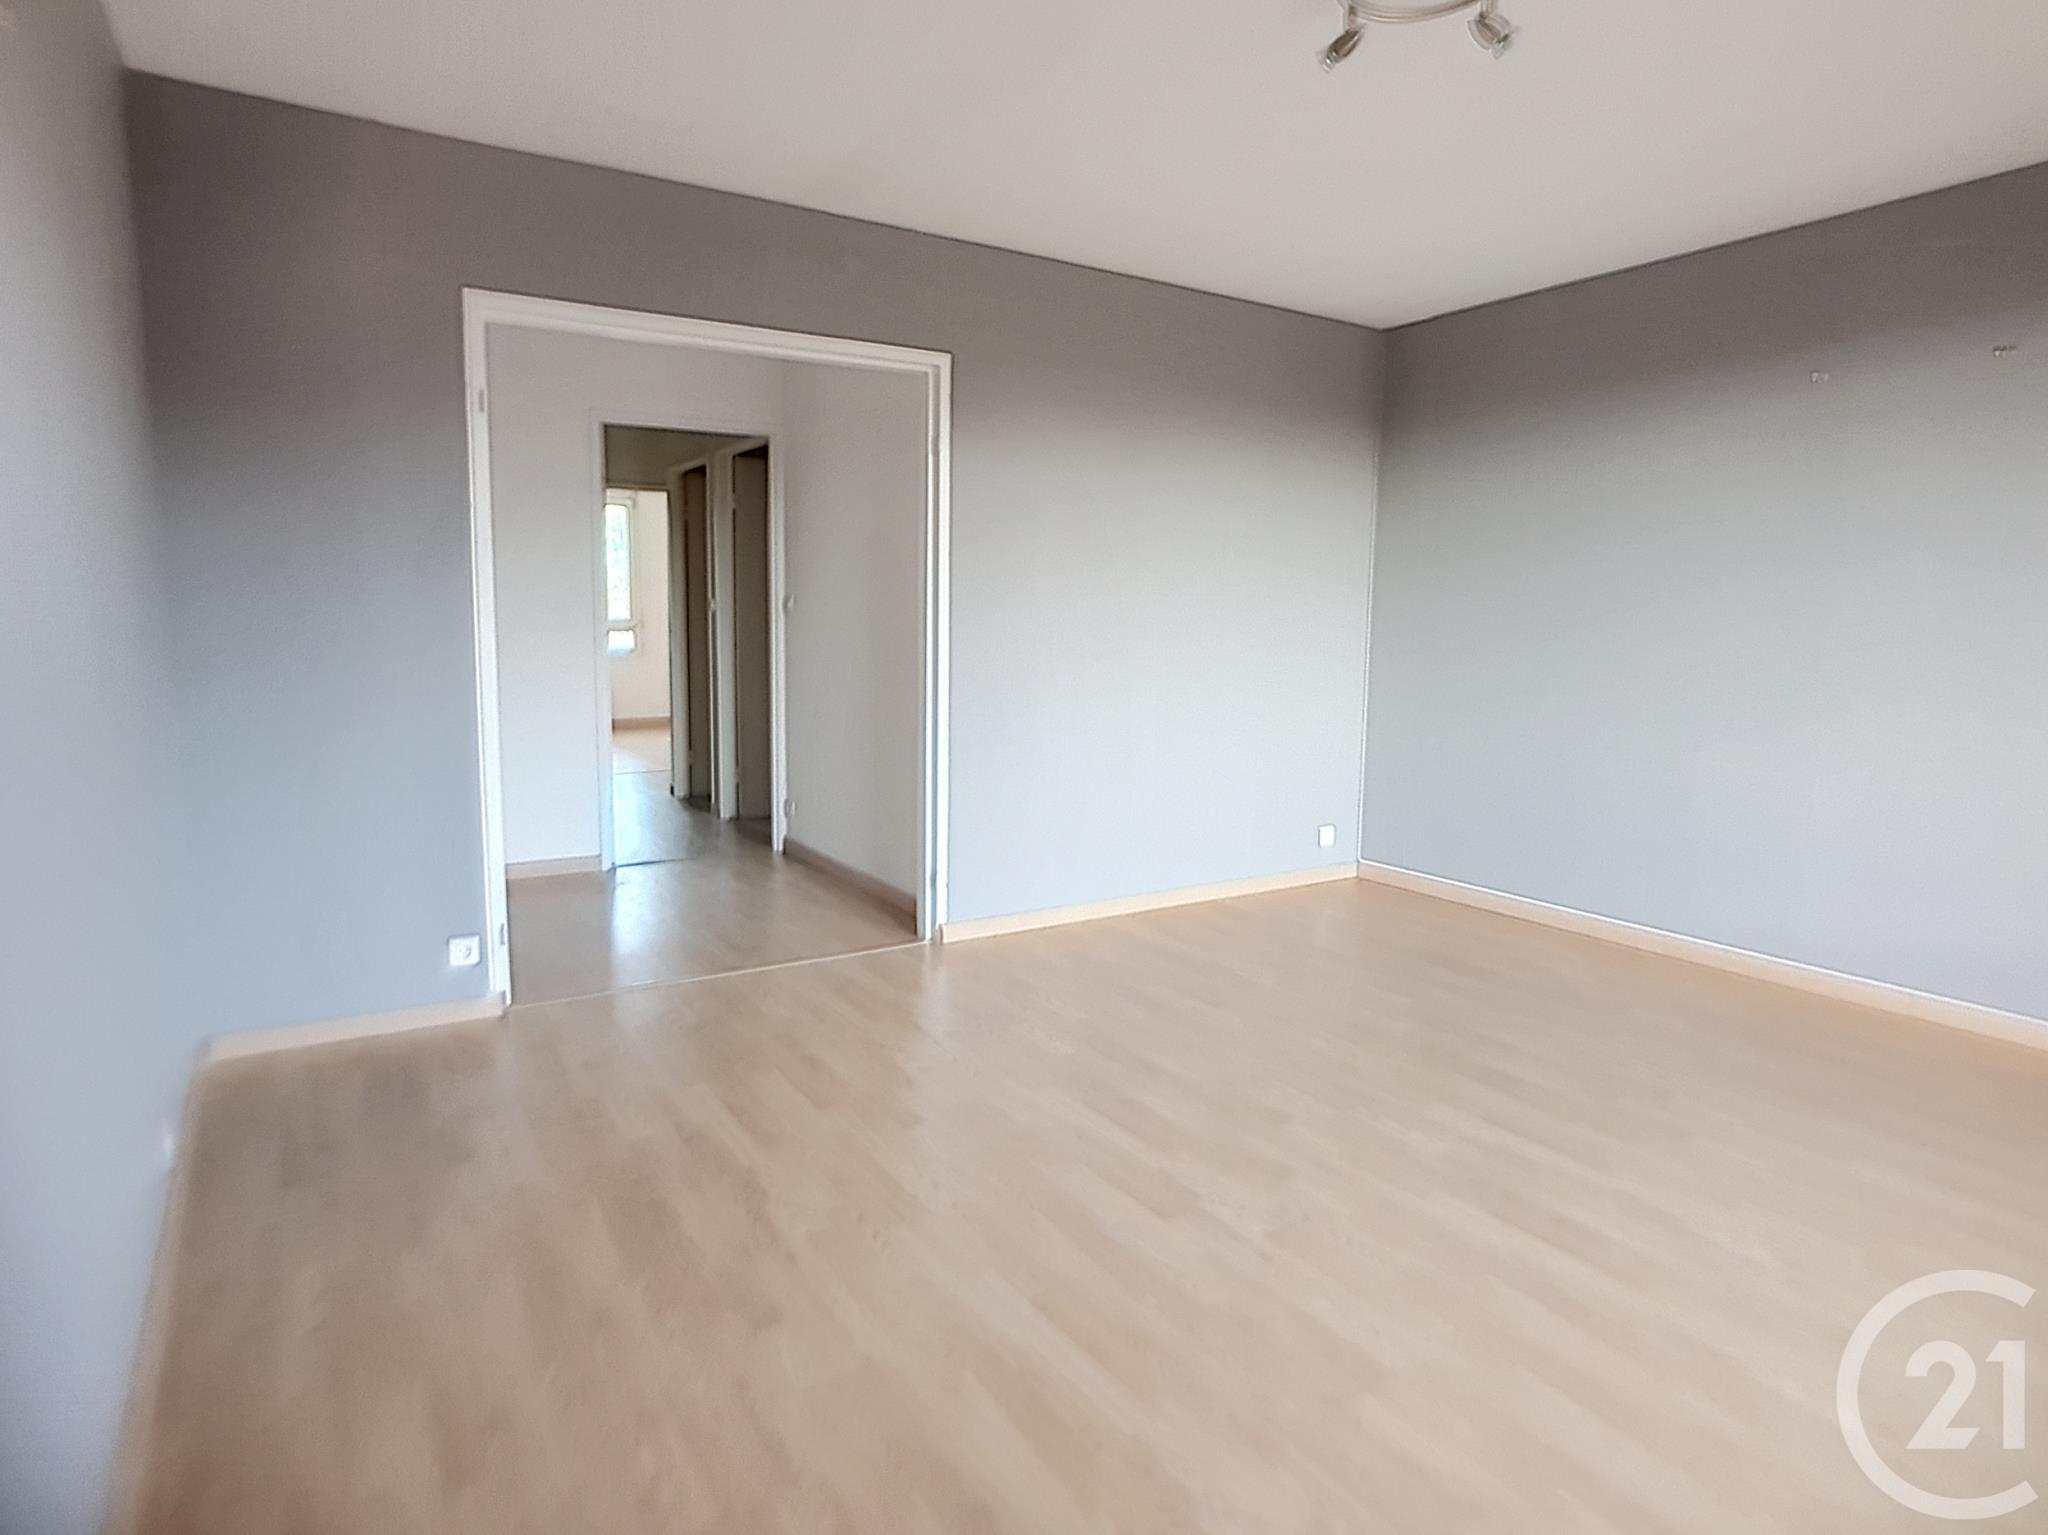 appartement f3 3 pi ces vendre reims 51100 ref 13933 century 21. Black Bedroom Furniture Sets. Home Design Ideas